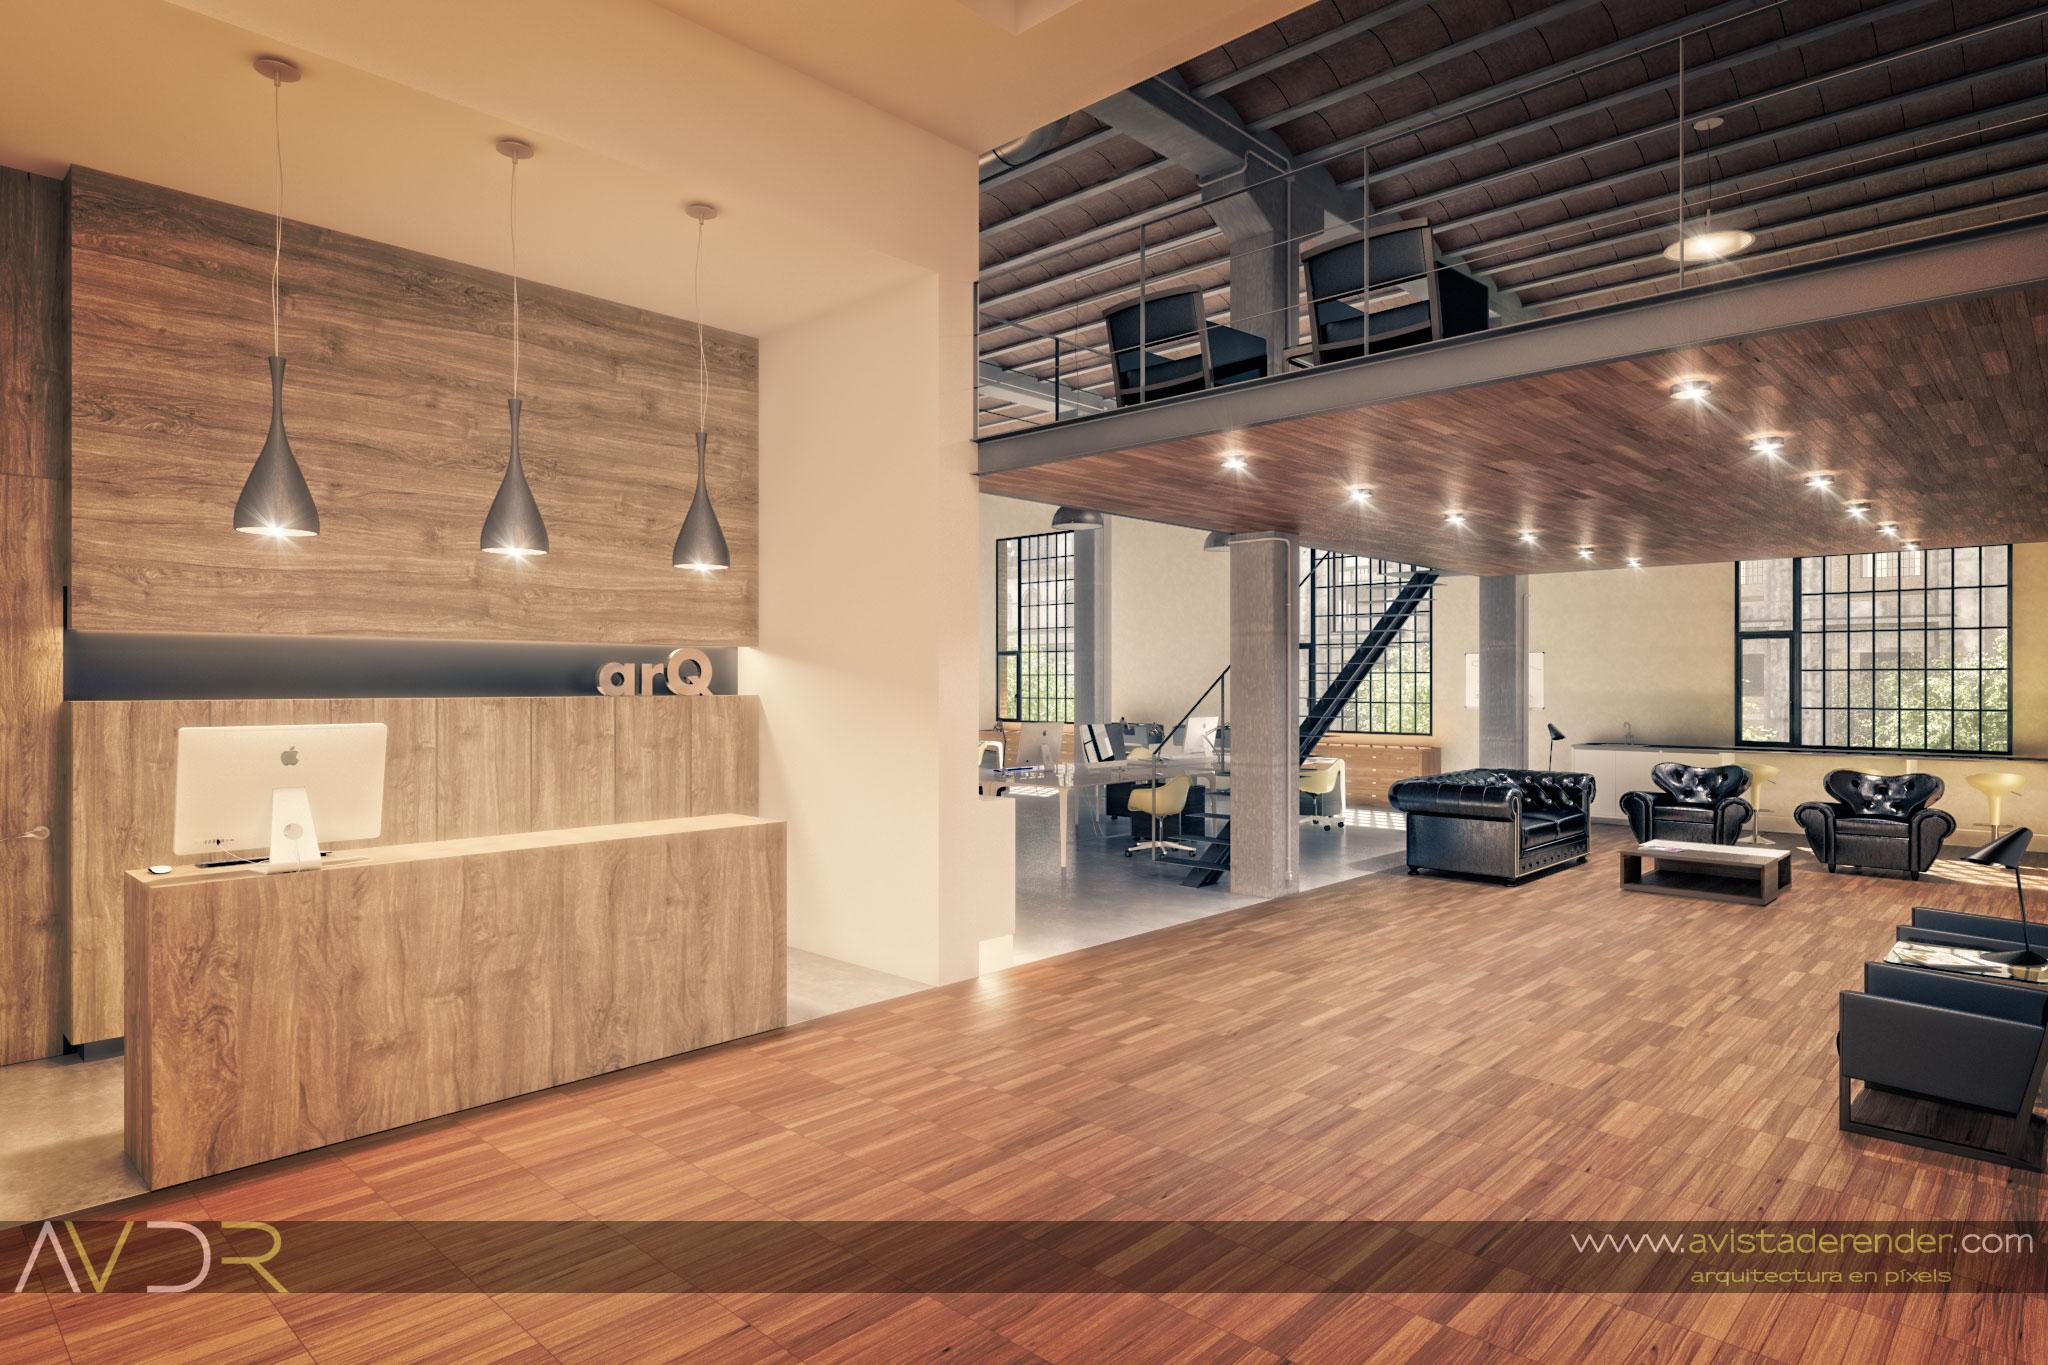 Render Estudio Arquitectura Recepcion By Avistaderender